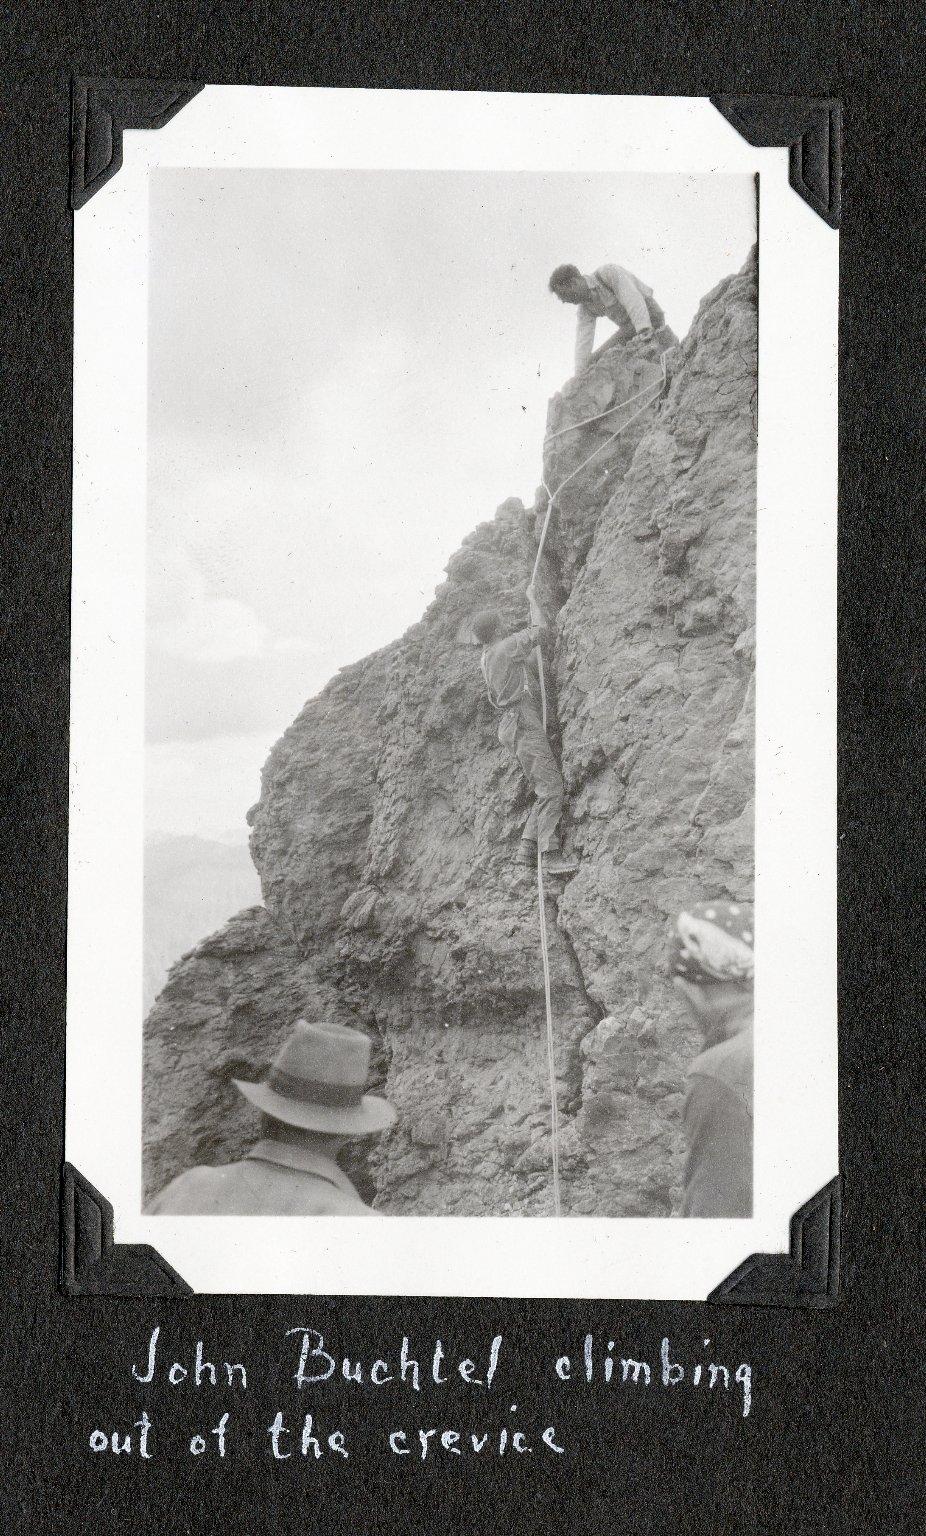 John Buchtel climbing out of the crevice at Coxcomb Peak